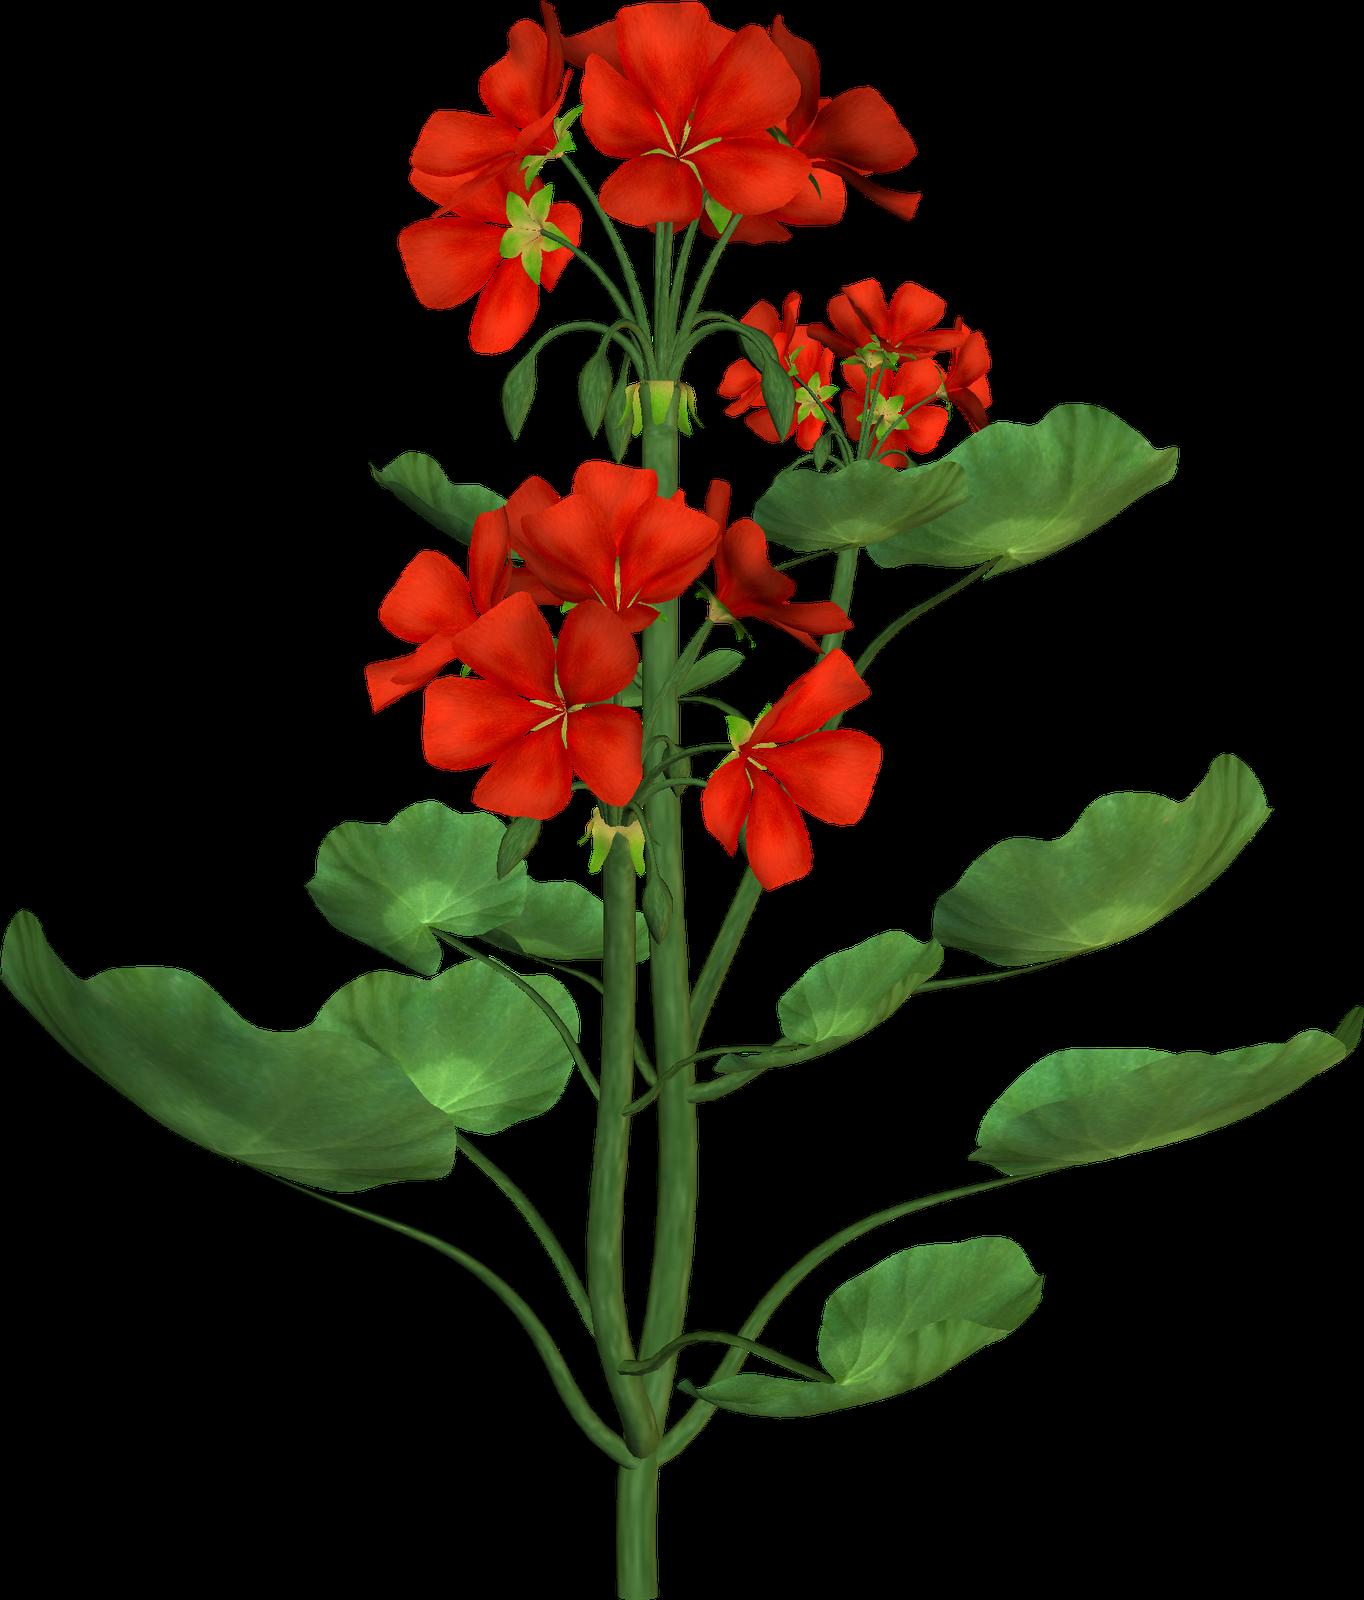 Tree seed clipart clip art Flower Botanical illustration Botany Clip art - flower tree 1364 ... clip art